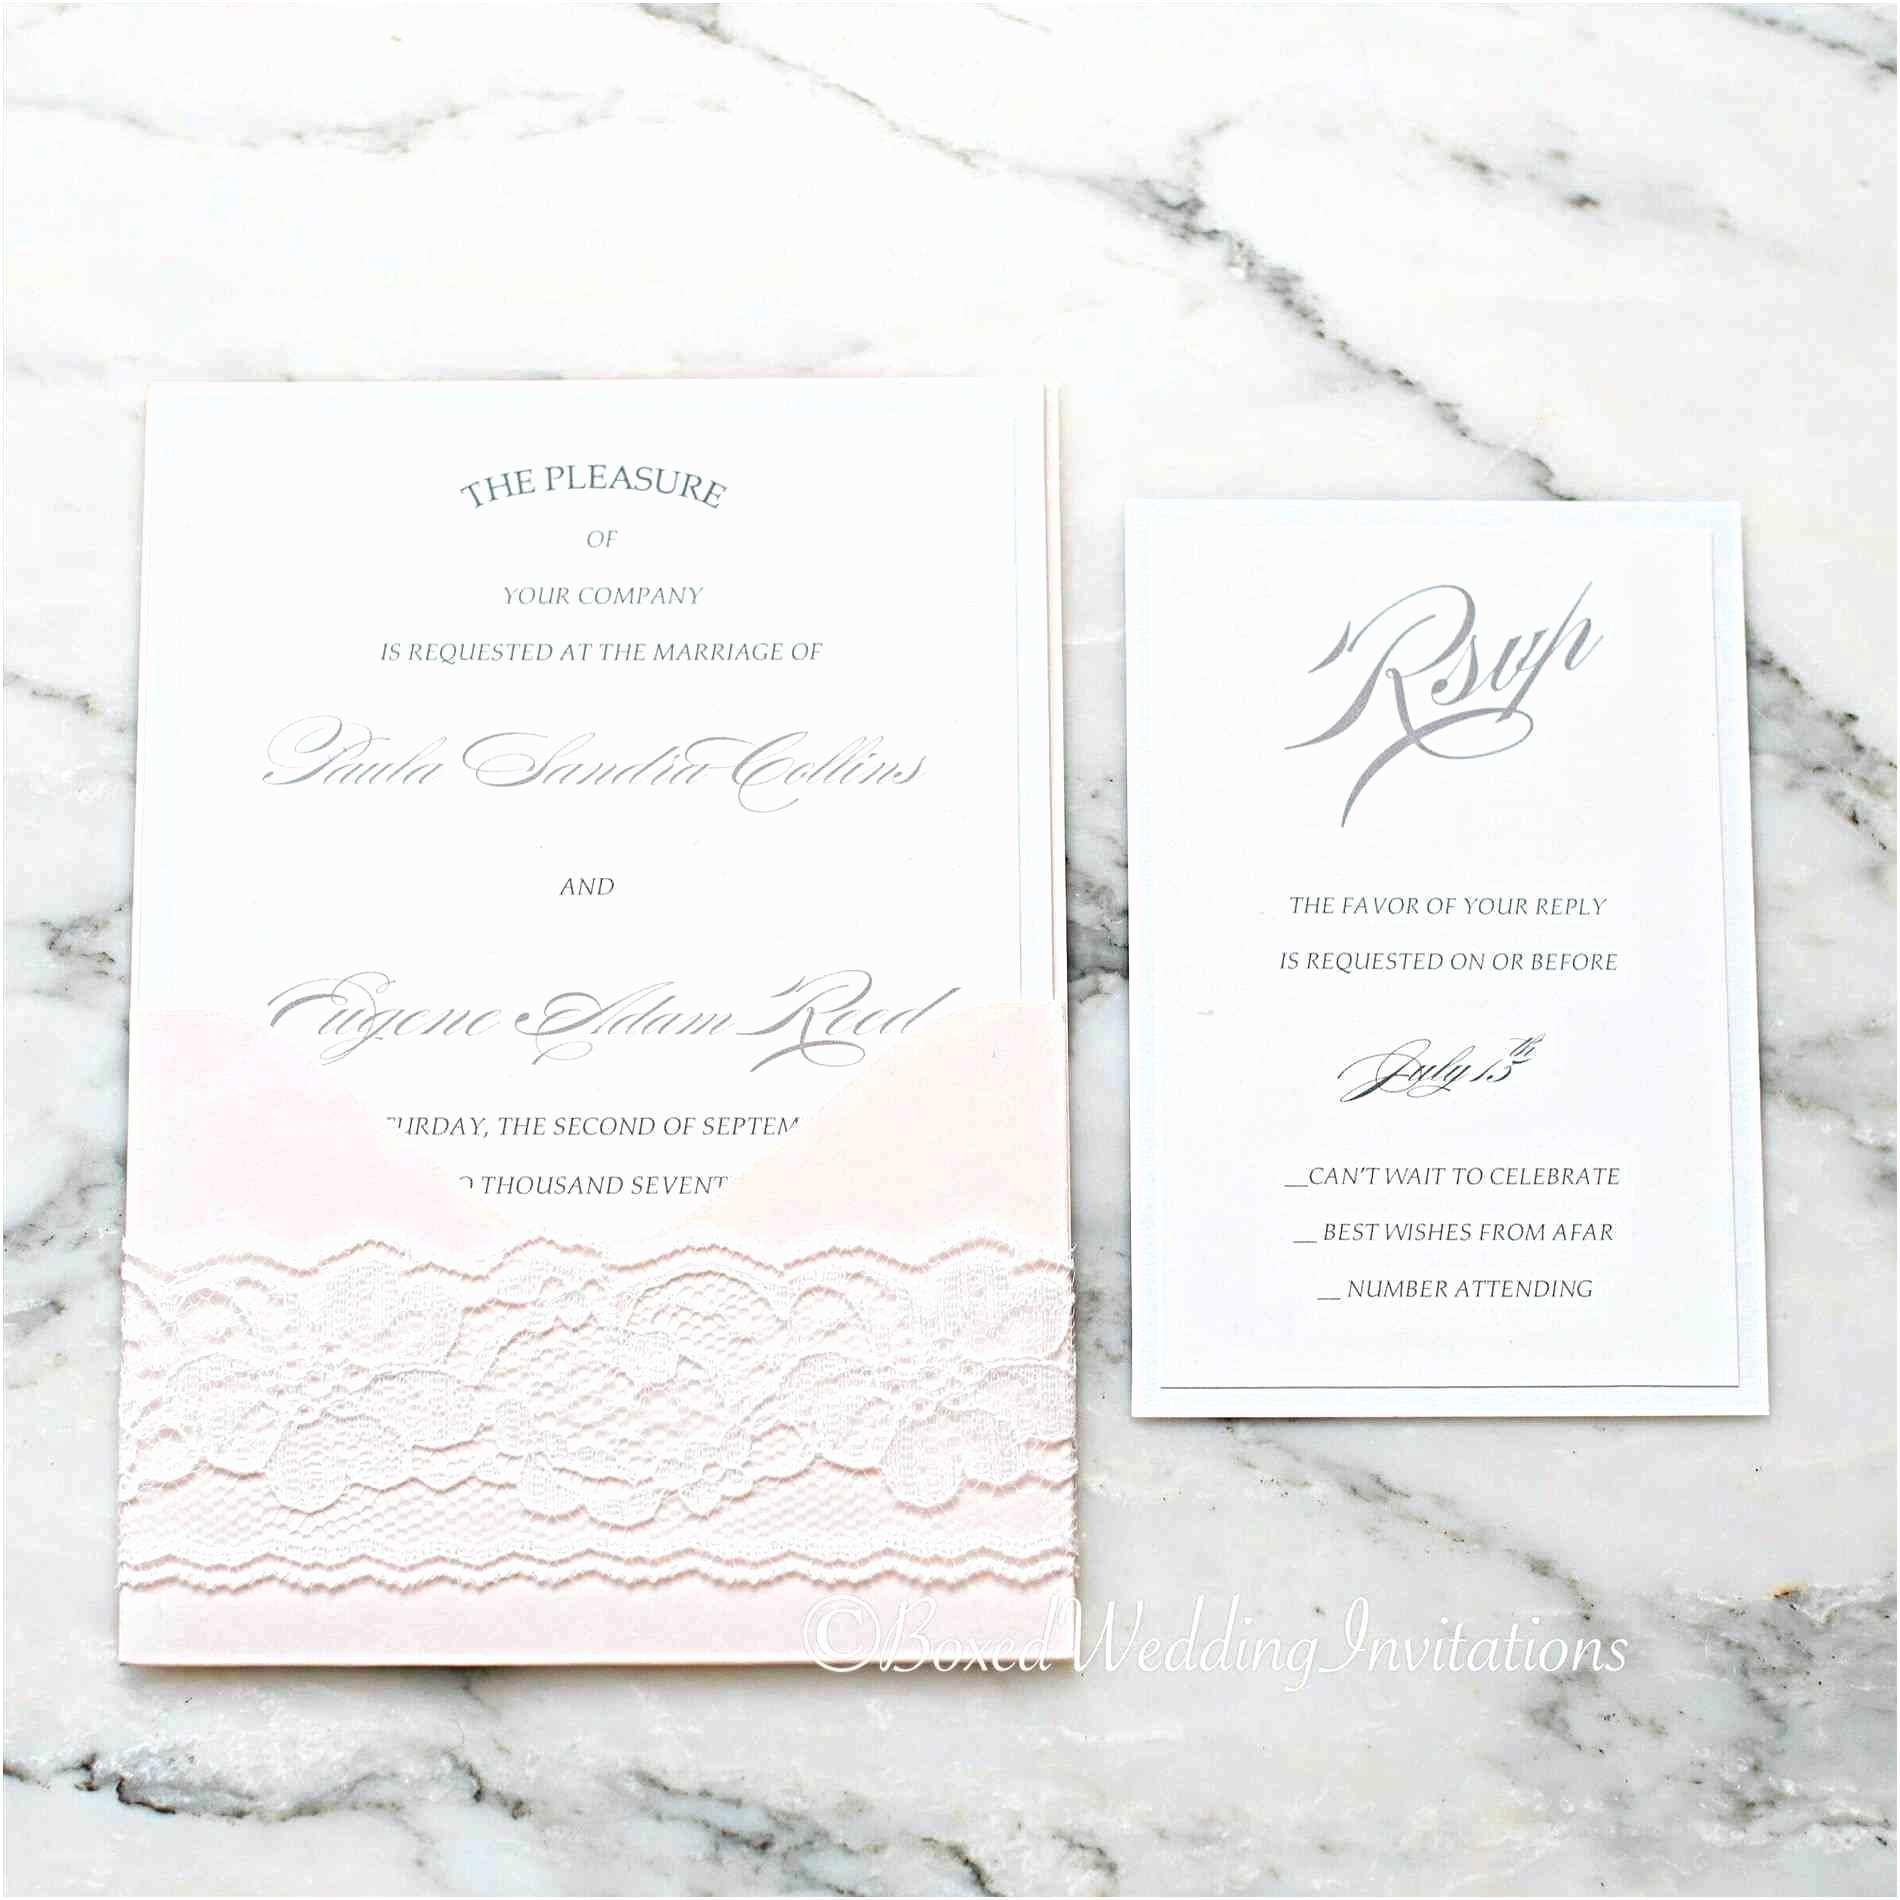 Best Place for Wedding Invitations 11 Unique Beach Wedding Invites Wedding Idea